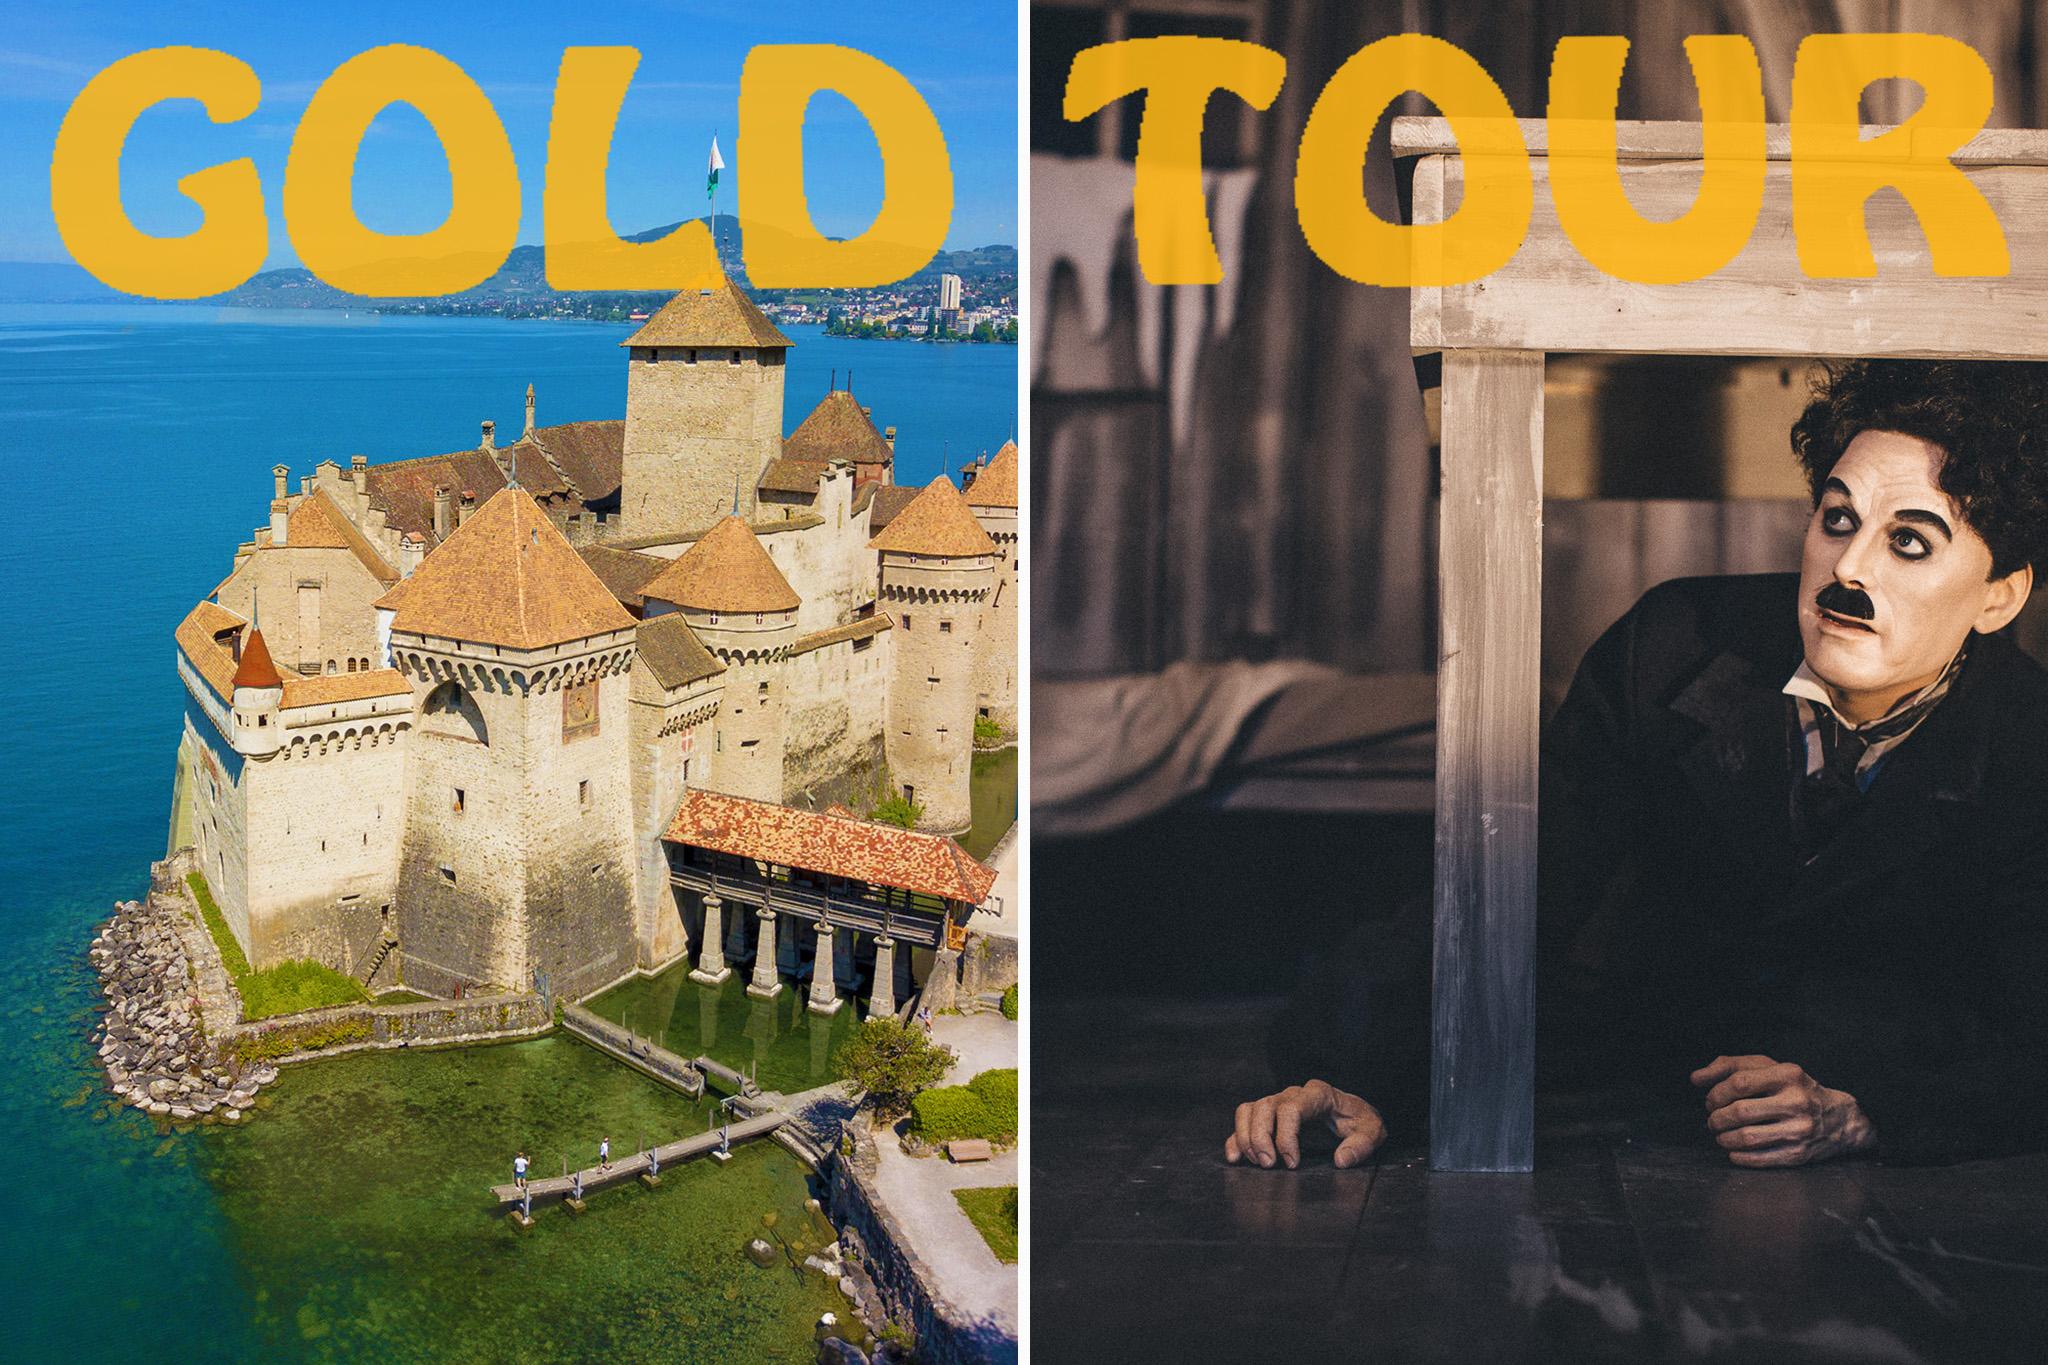 Chaplin Gold